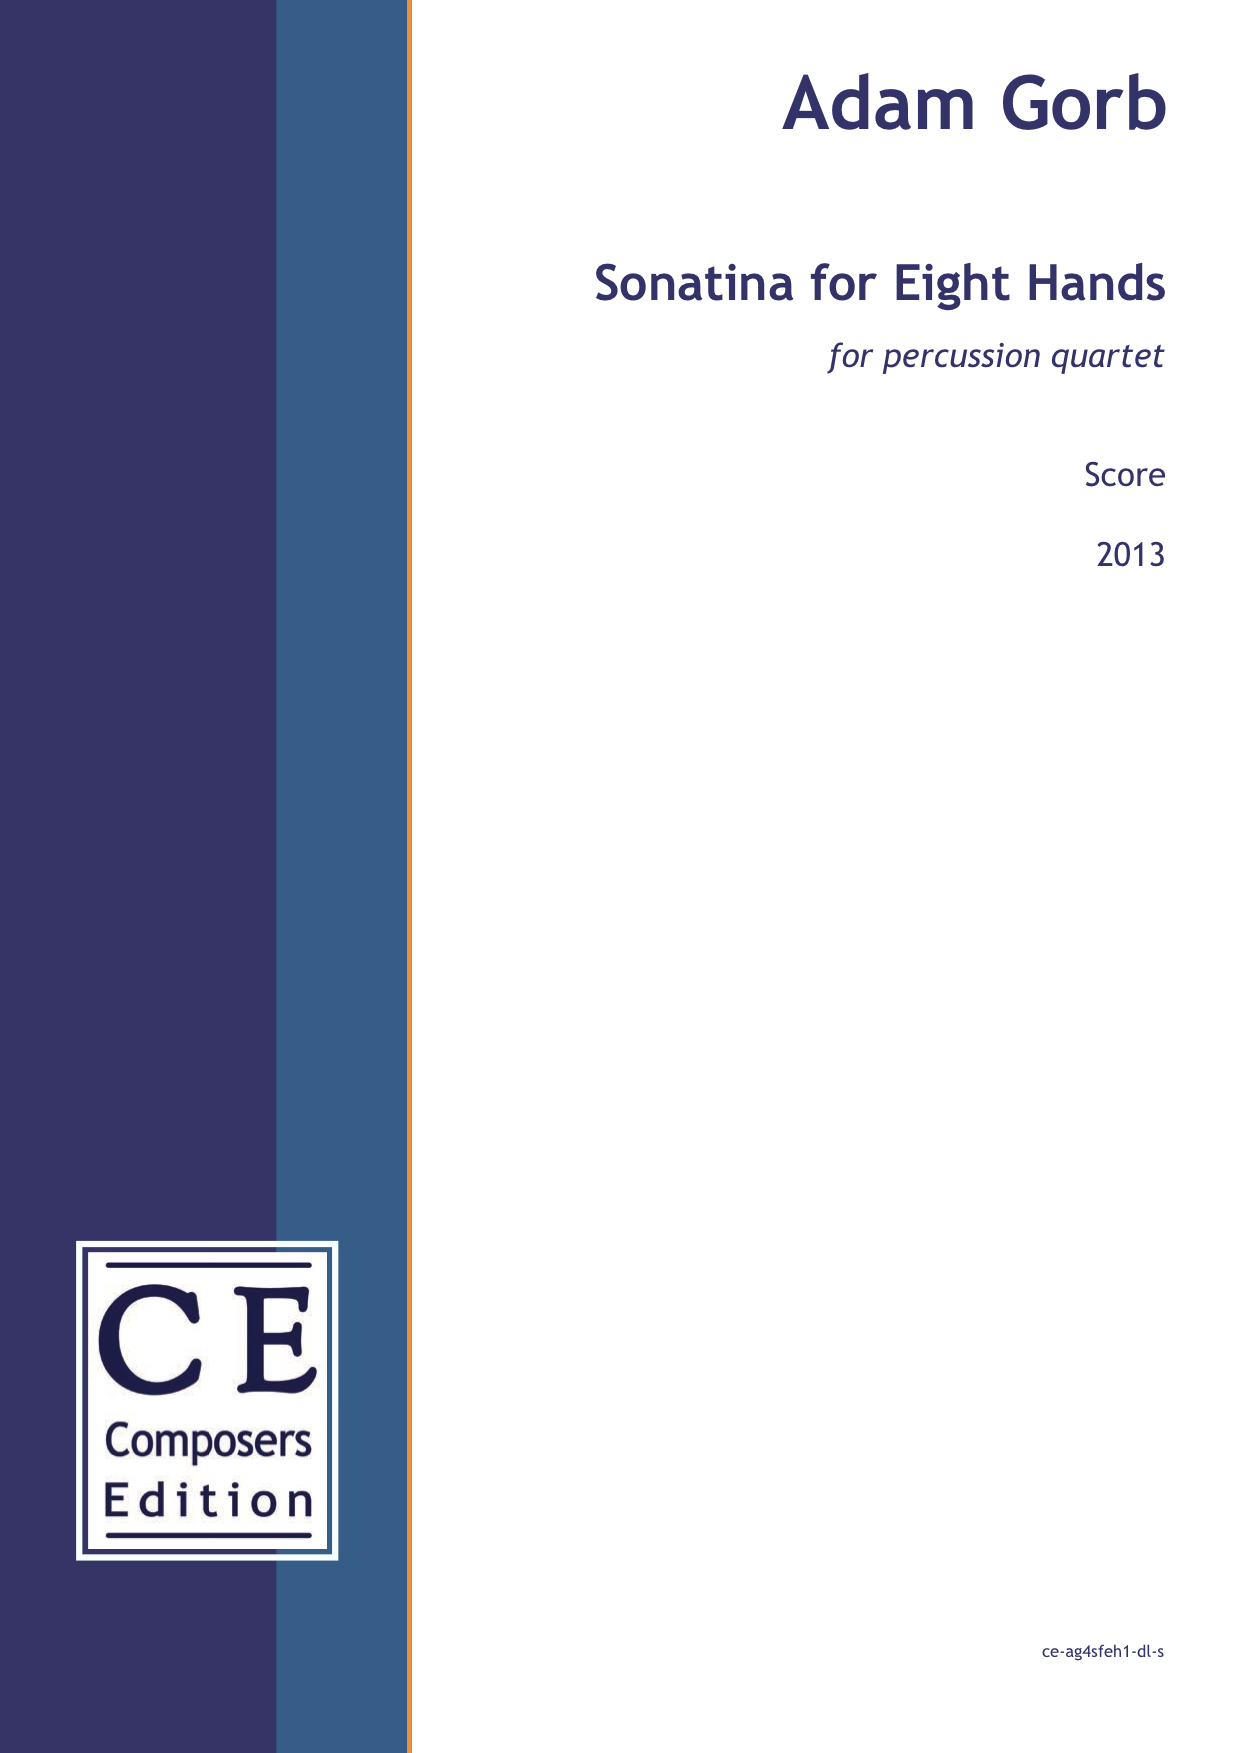 Adam Gorb: Sonatina for Eight Hands for percussion quartet